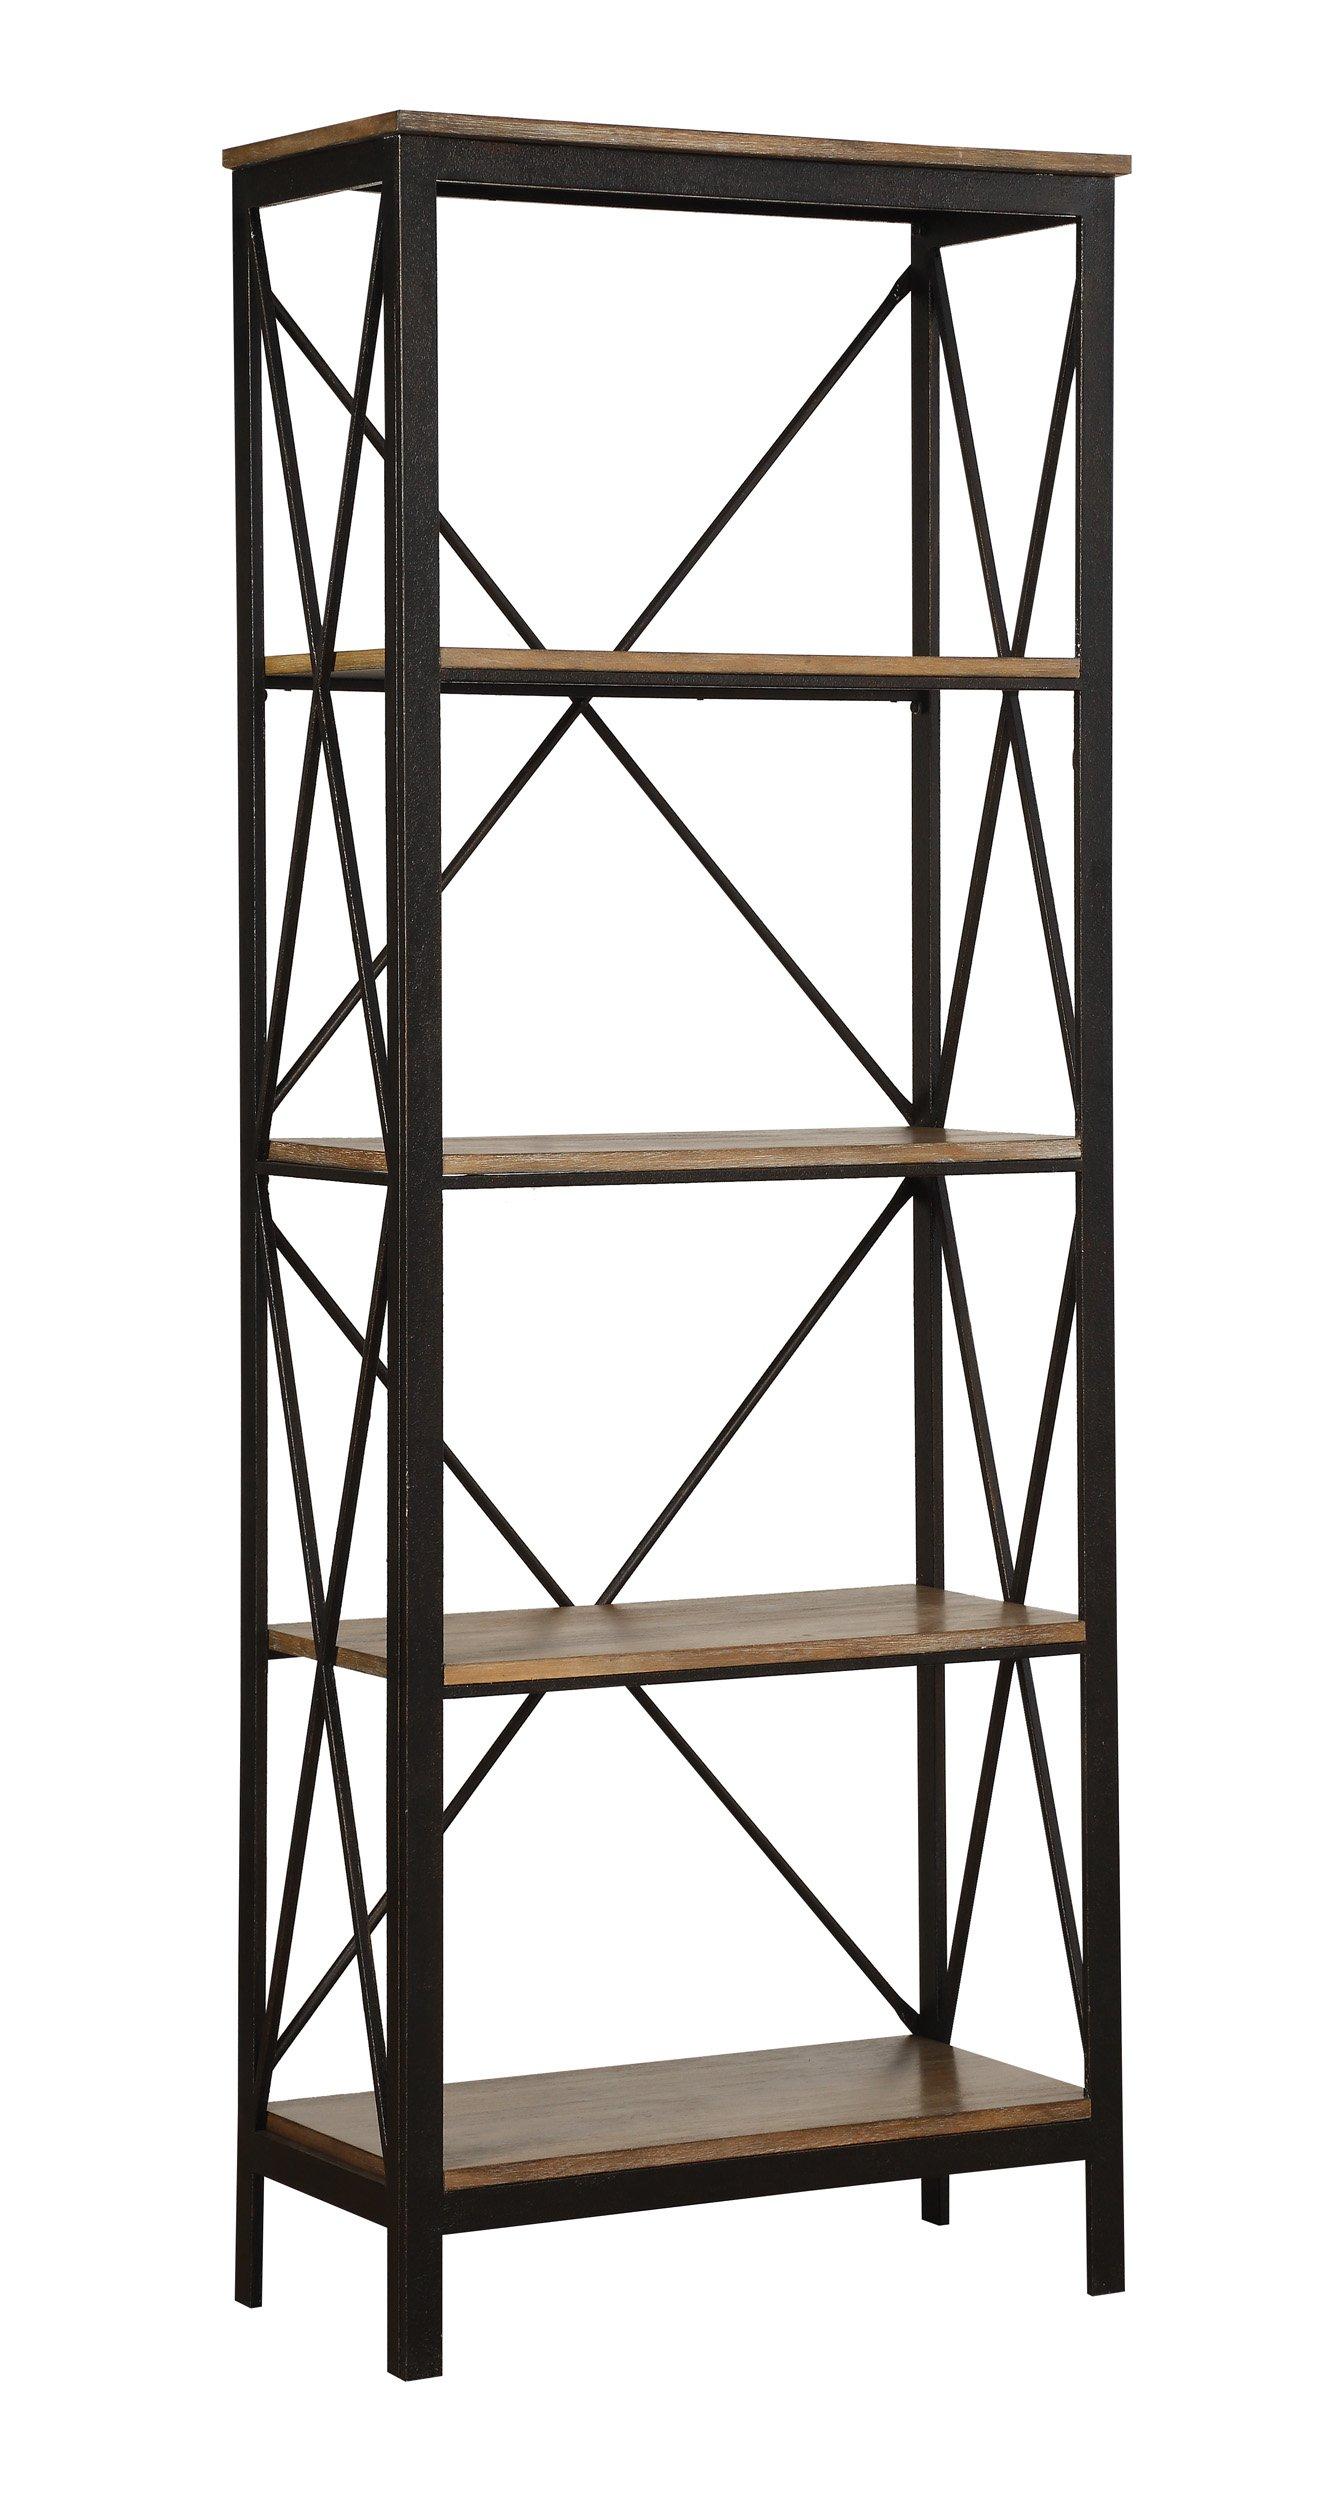 Homelegance Text Industrial Rustic 4-Tier Two-Tone Metal Bookcase, Black/Brown